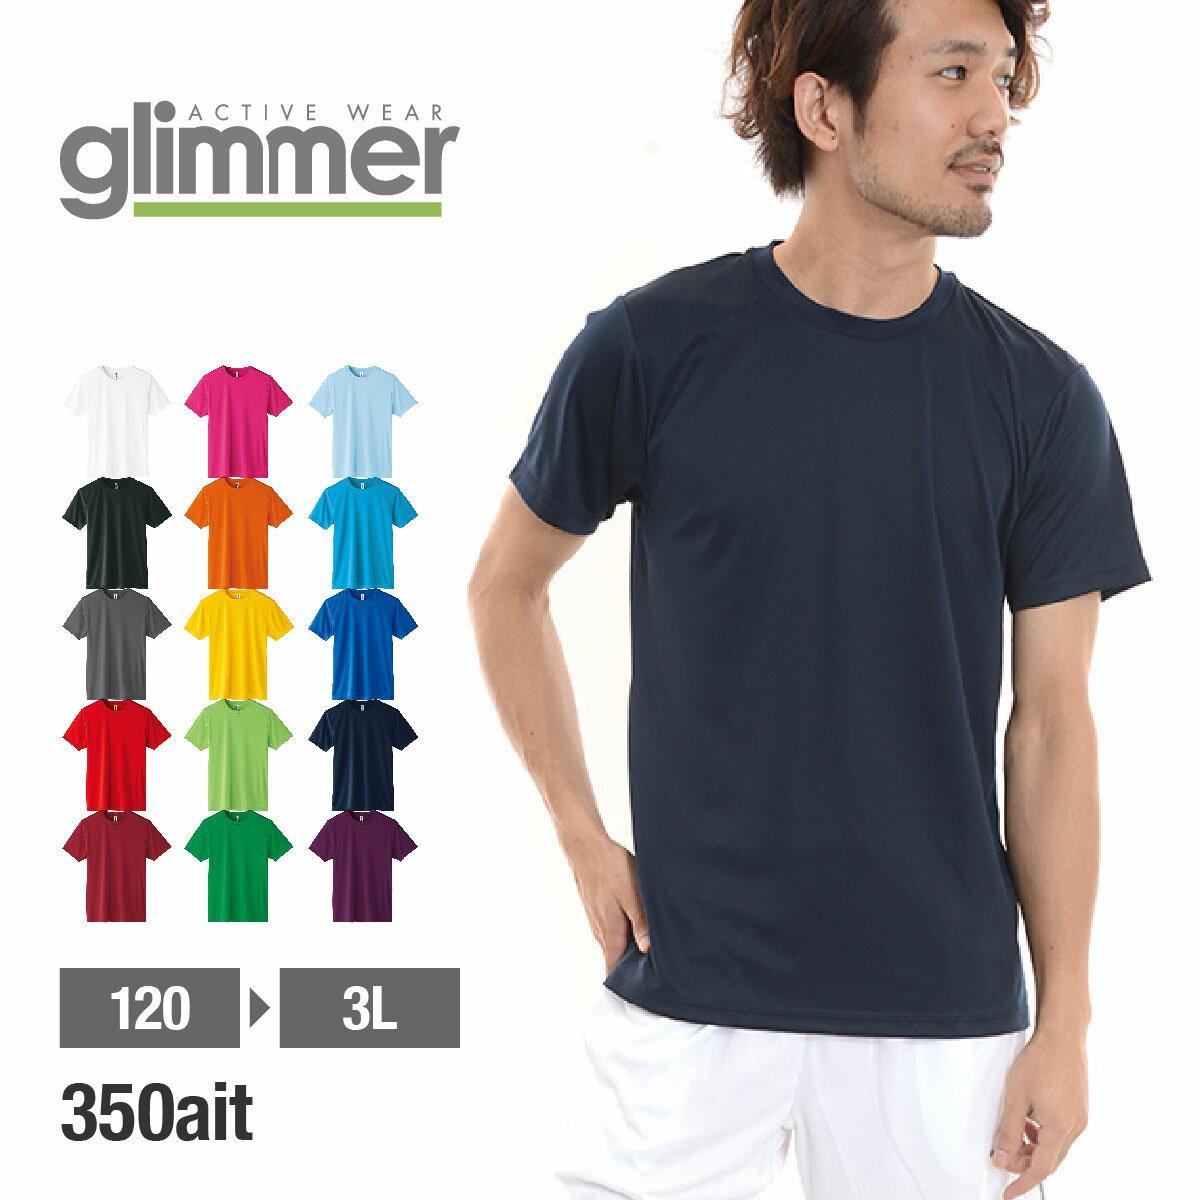 tシャツ 速乾【GLIMMER(グリマー)|3.5オンス インターロックドライTシャツ 350ait】tシャツ ドライ 半袖 速乾 メンズ 男女兼用 吸汗 速乾 薄手 uvカット 紫外線対策 チーム ユニフォーム 白 黒 赤 青 など